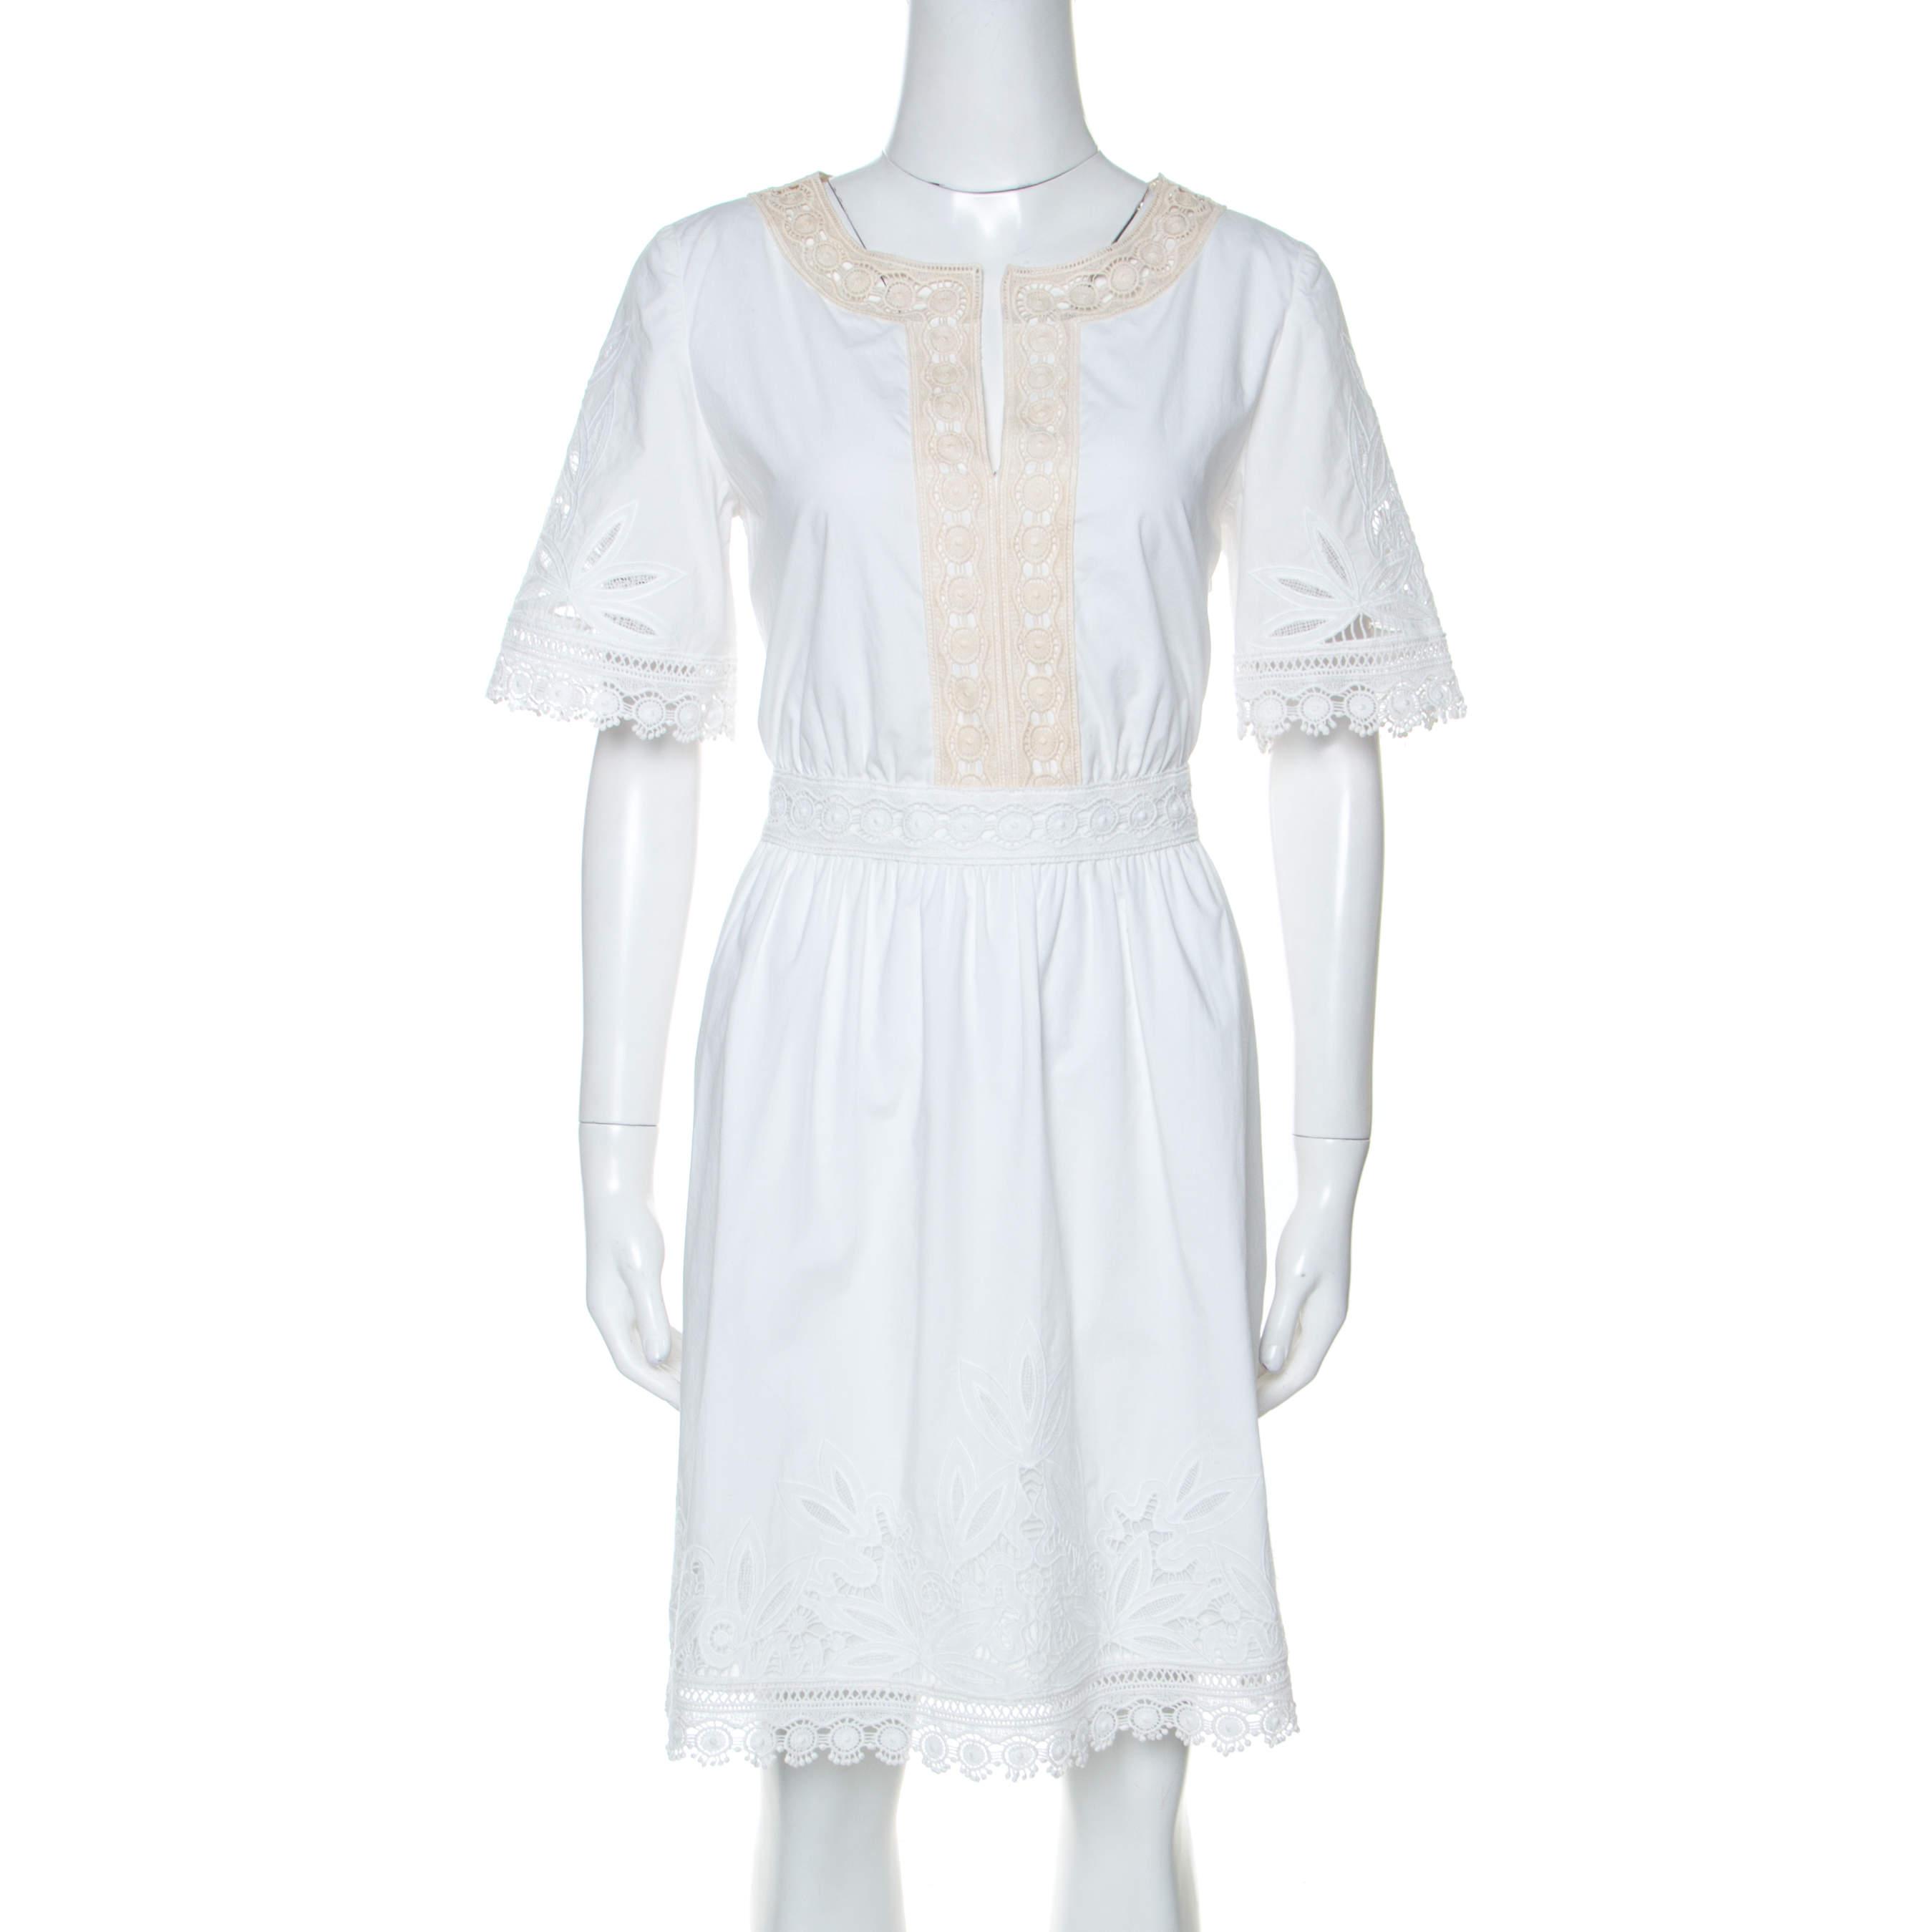 Tory Burch White Cotton Lace Trim Larissa Dress S